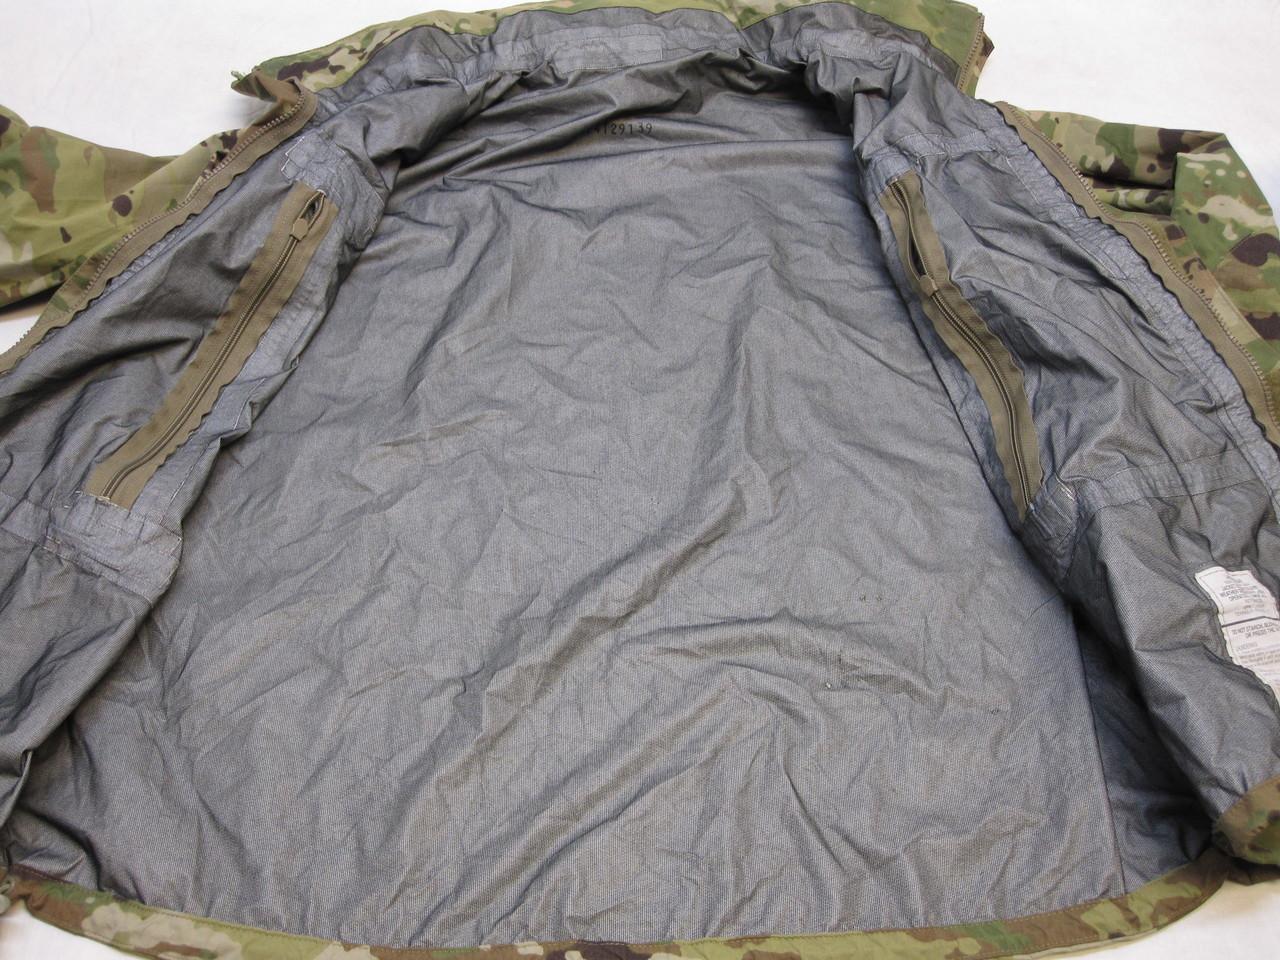 ARMY OCP MULTICAM LEVEL 6 COLD/ WET WEATHER JACKET LARGE/REGULAR GEN III TOP br